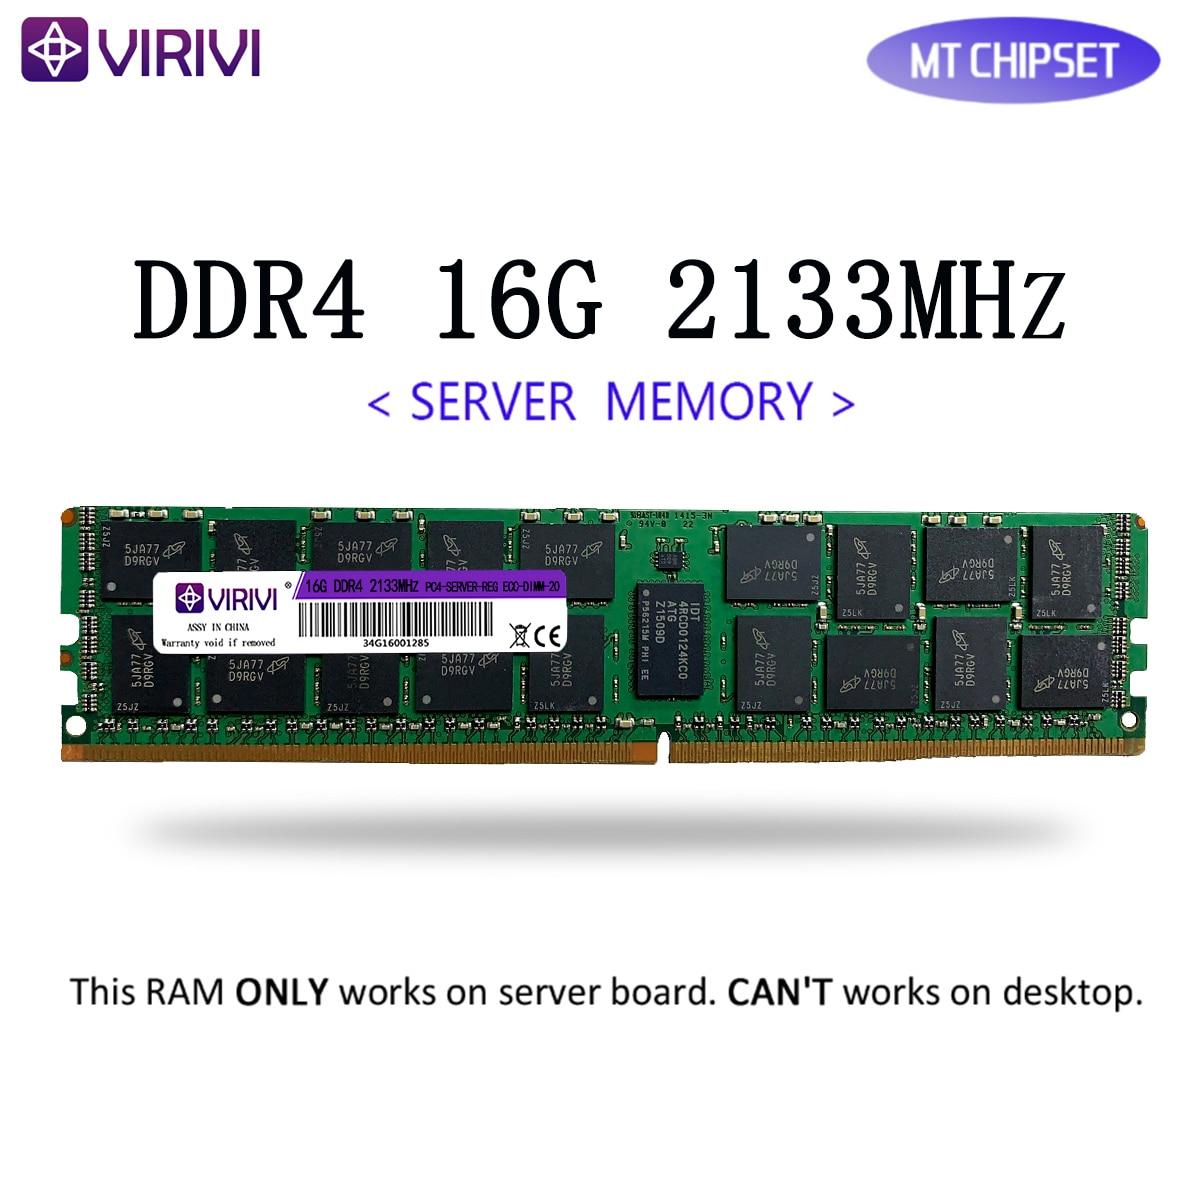 RAM VIRIVI DDR4 4GB 16GB 32GB Server Memory 2133MHz 2400Mhz REG ECC LGA 2011-3 Pin CPU X99 Motherboard Dimm